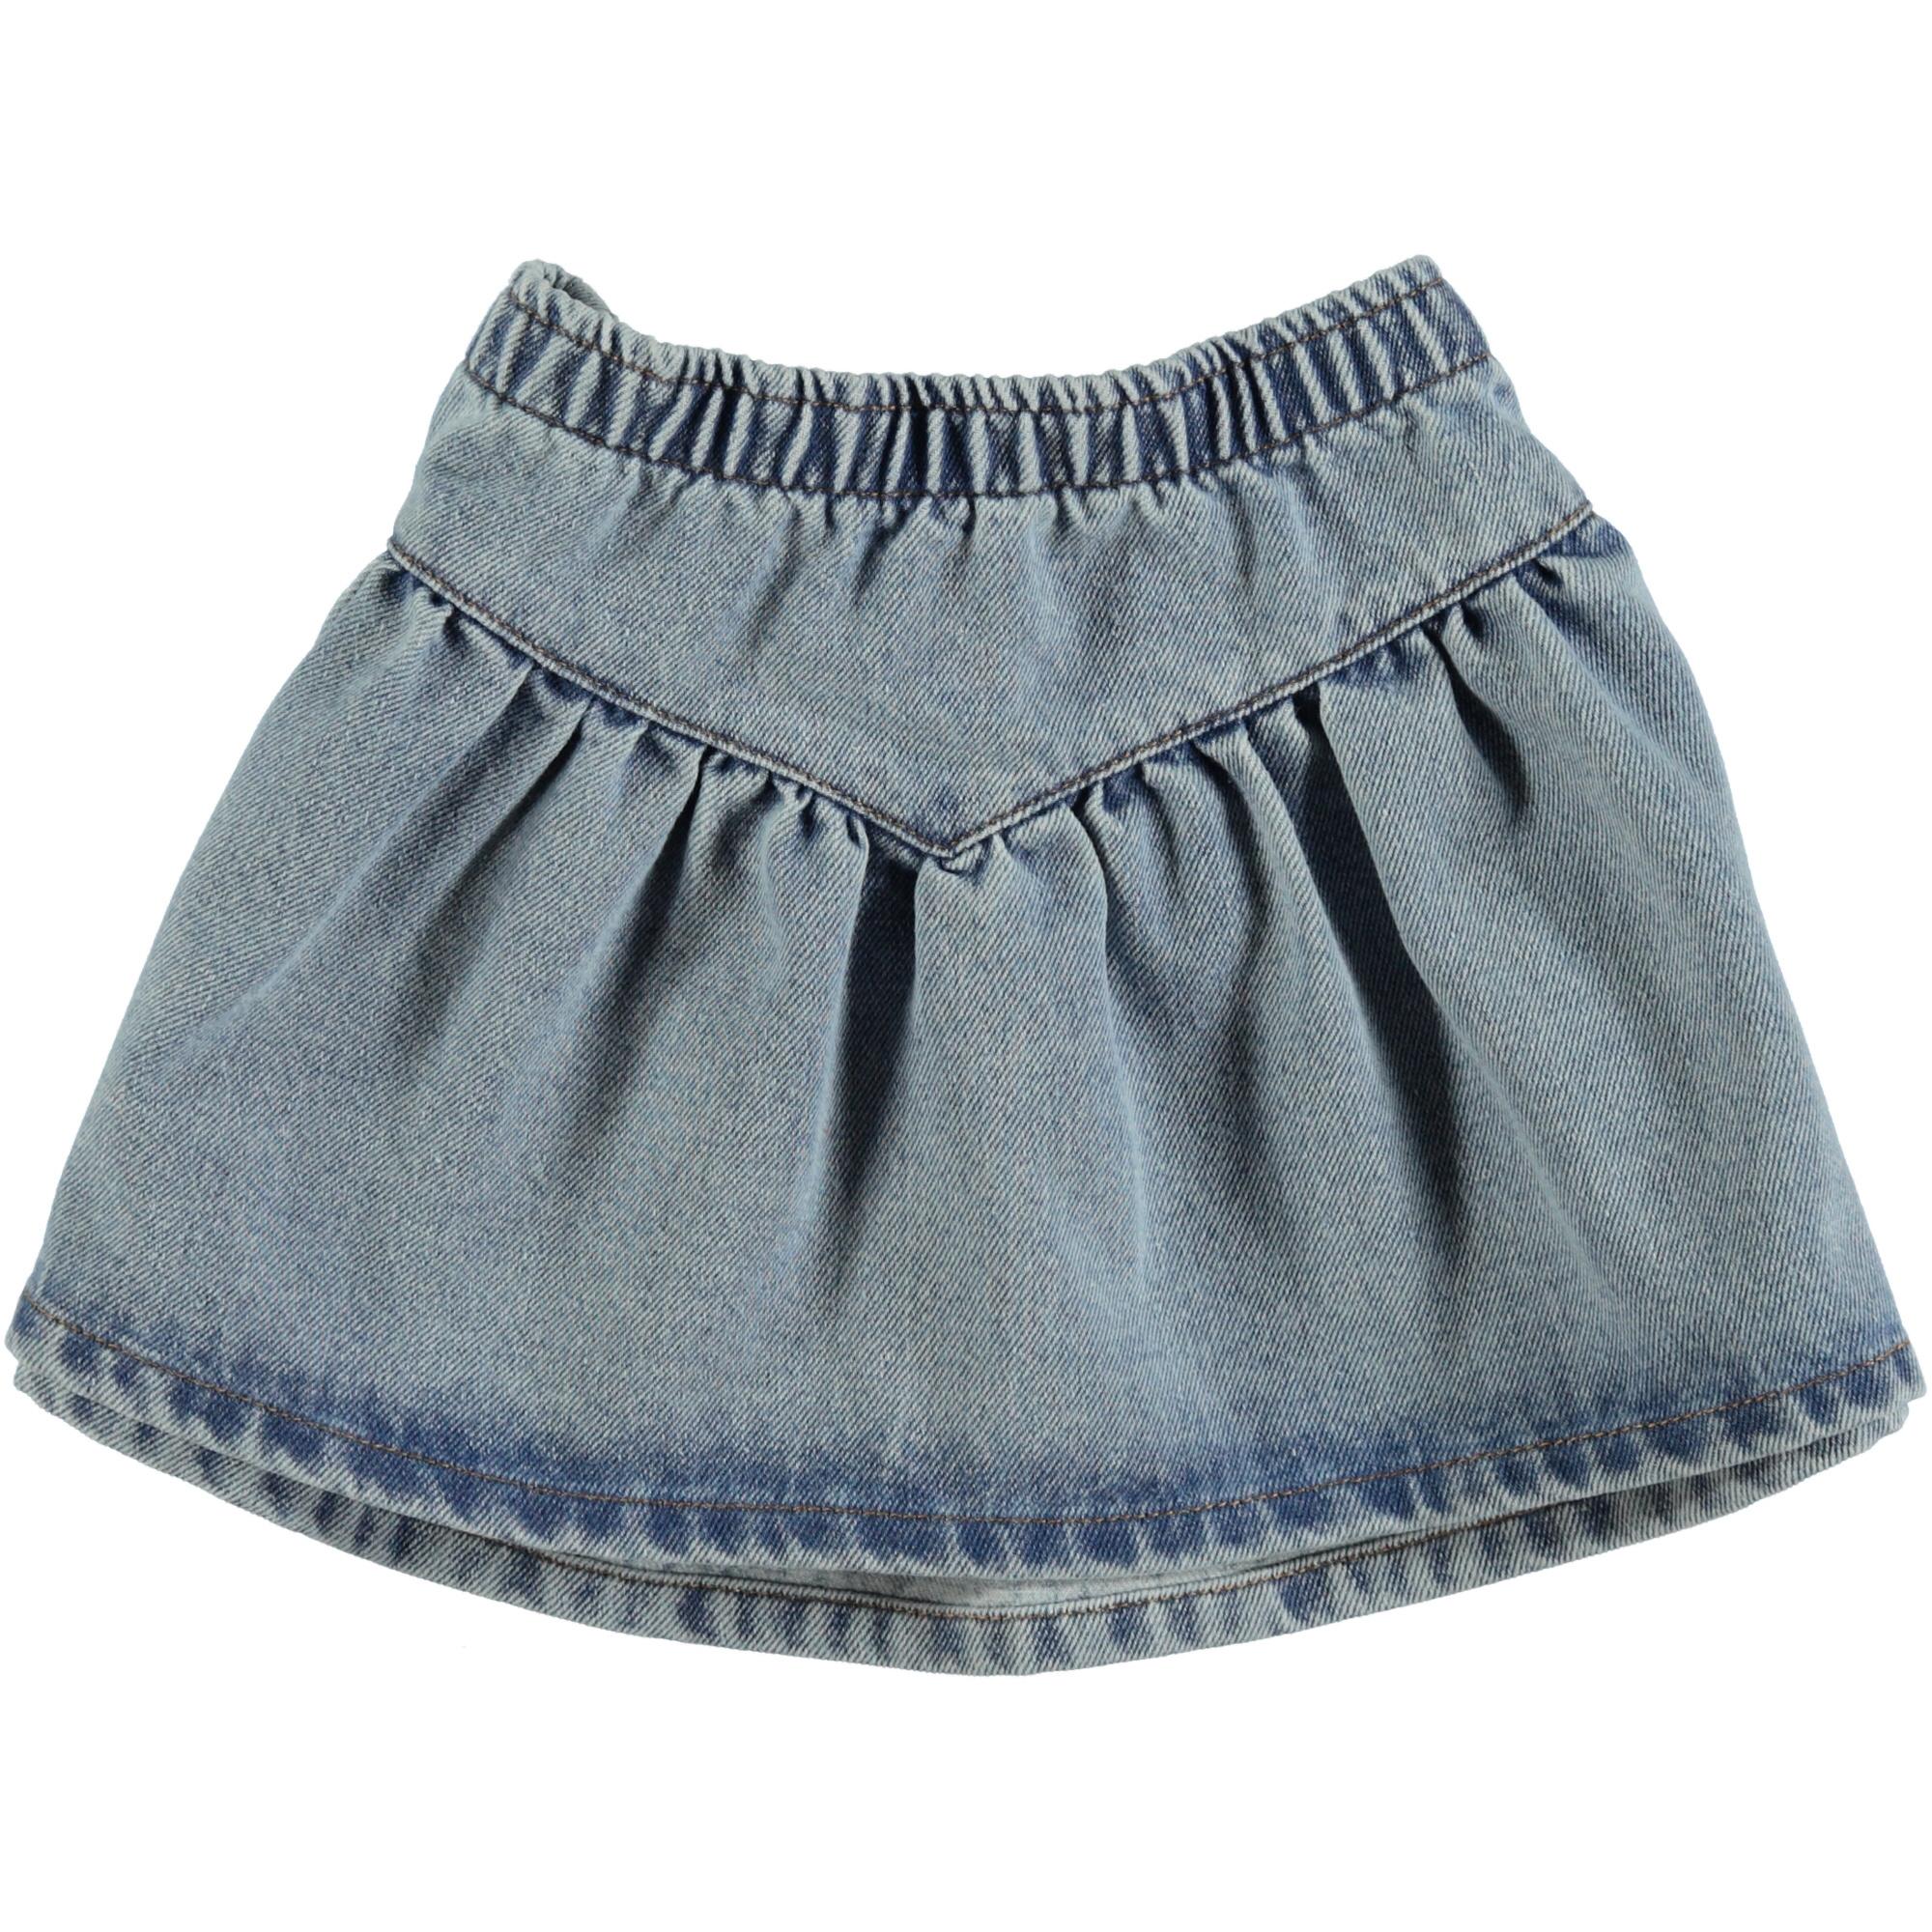 mini skirt   light blue washed denim-1